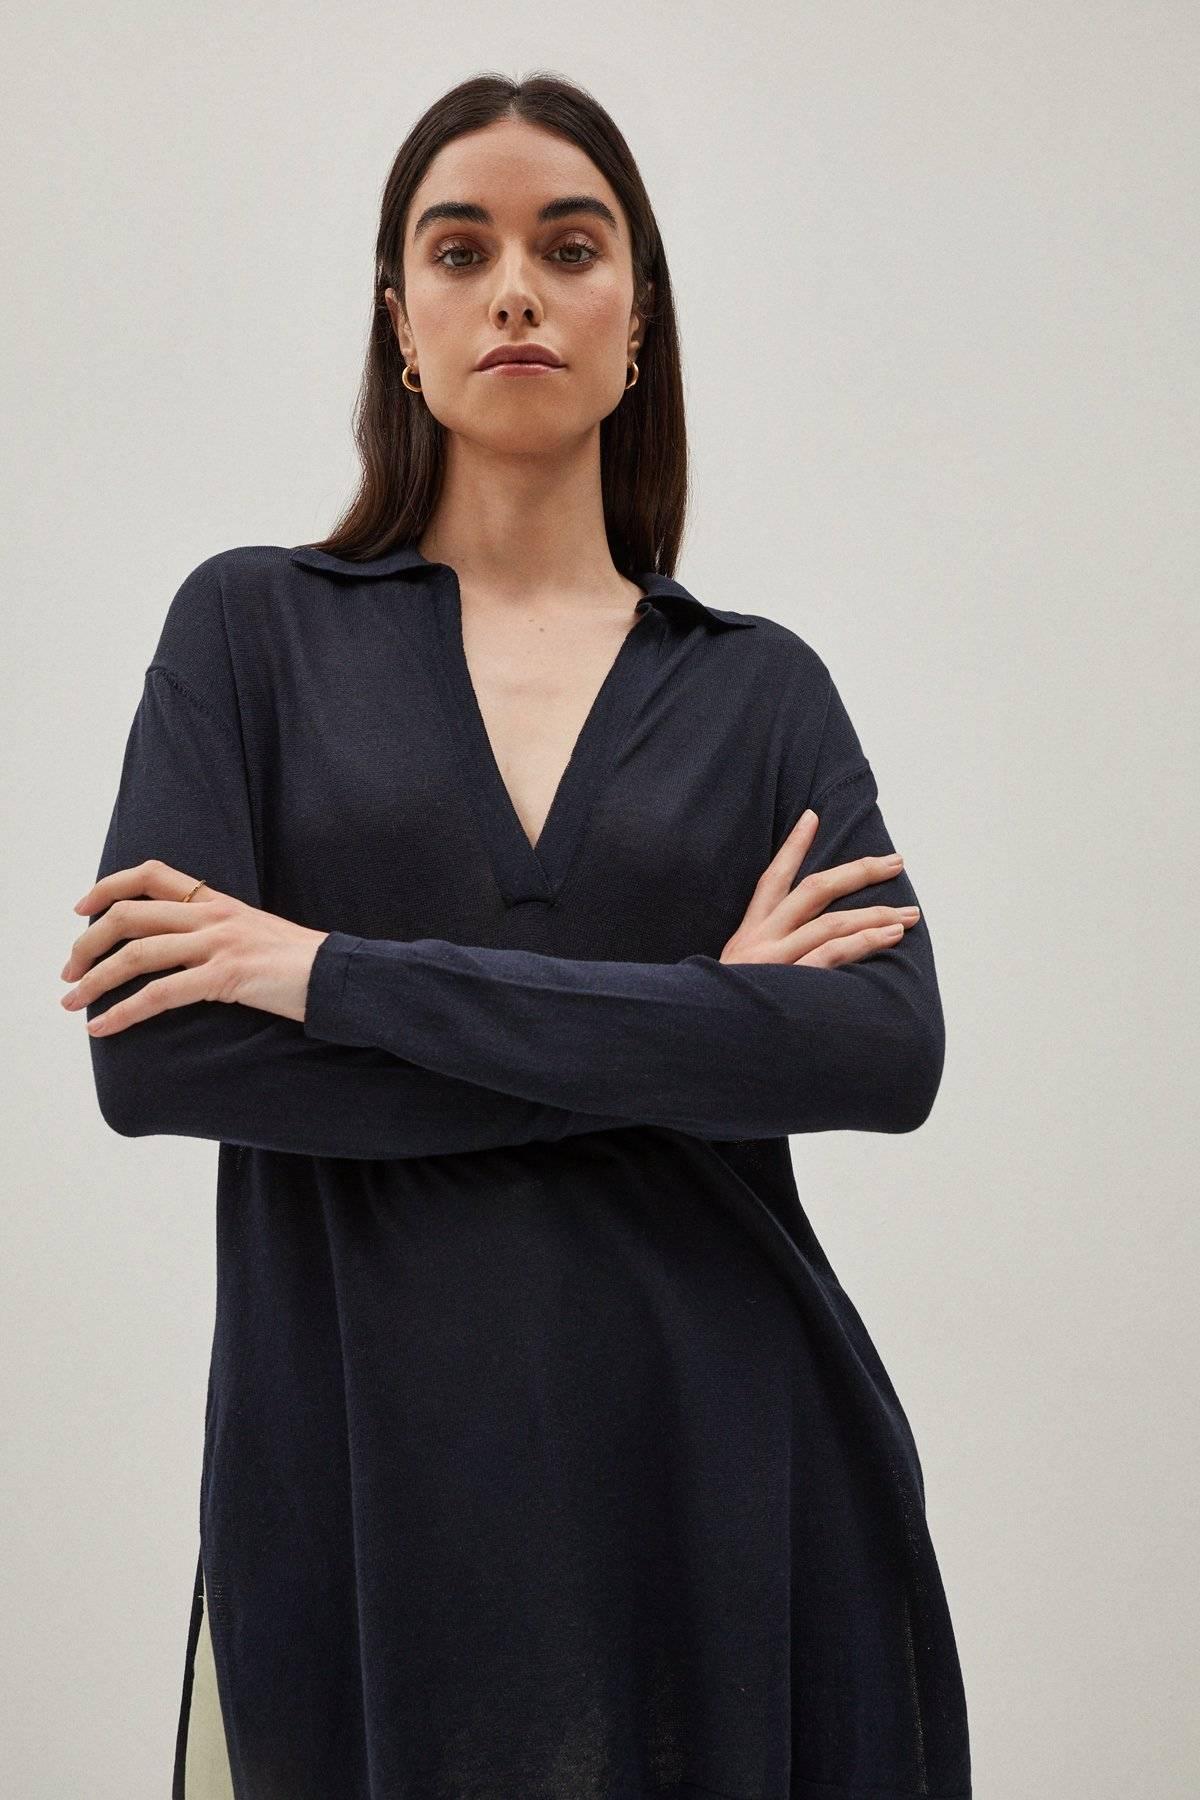 Artknit Studios The Silk Cotton Tunic - Blue Navy